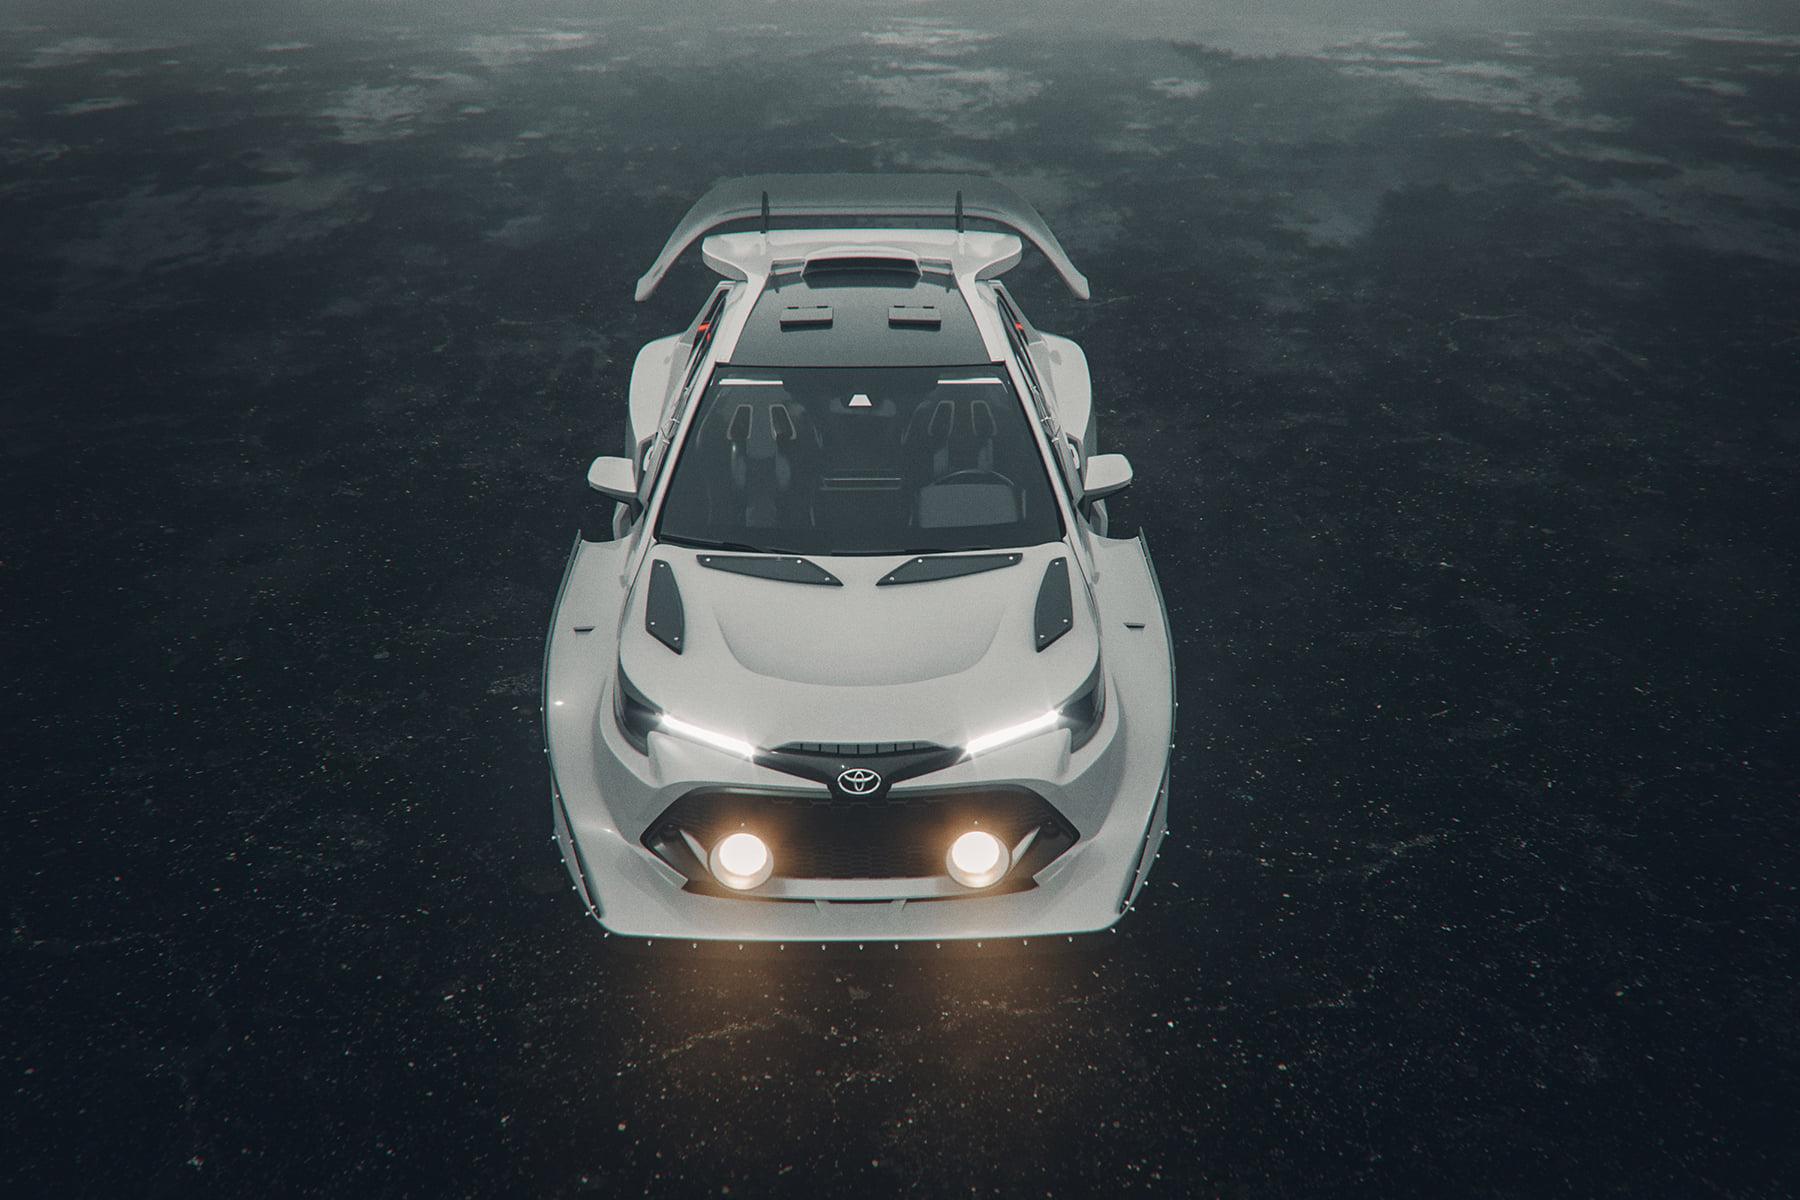 Toyota-GR-Corolla-Group-B-rally-car-2